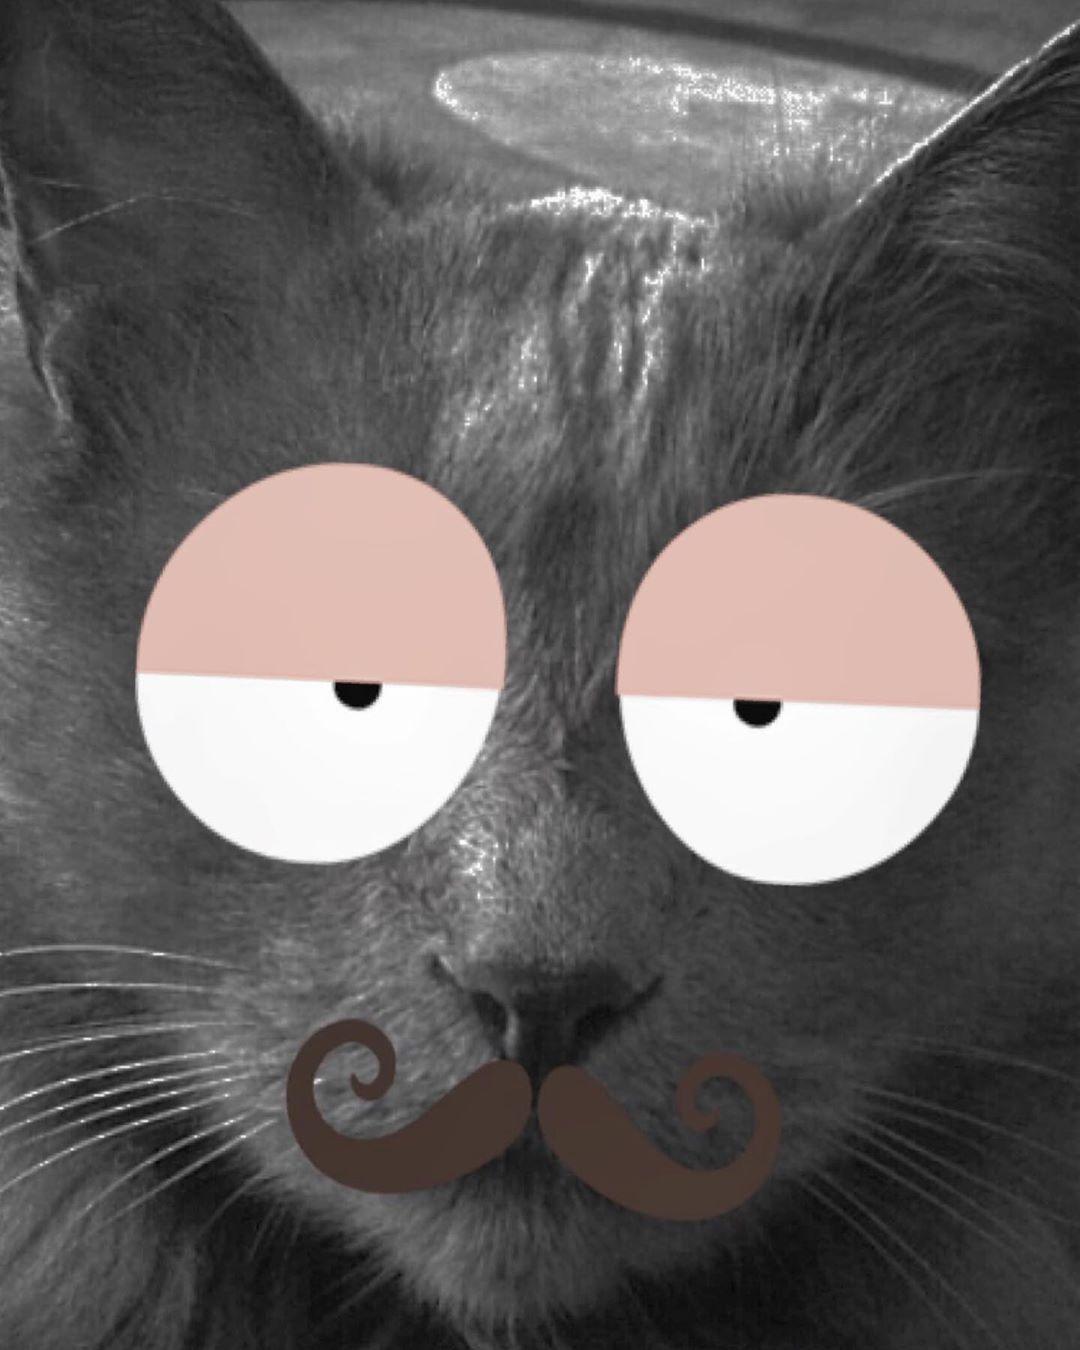 Cats Cat Catsofinstagram Catstagram Catlife Meow Funnycats Mycats Catganster Catstory Lovecat Catfood Instacat Sl Cat Day Cute Animals Cat Life